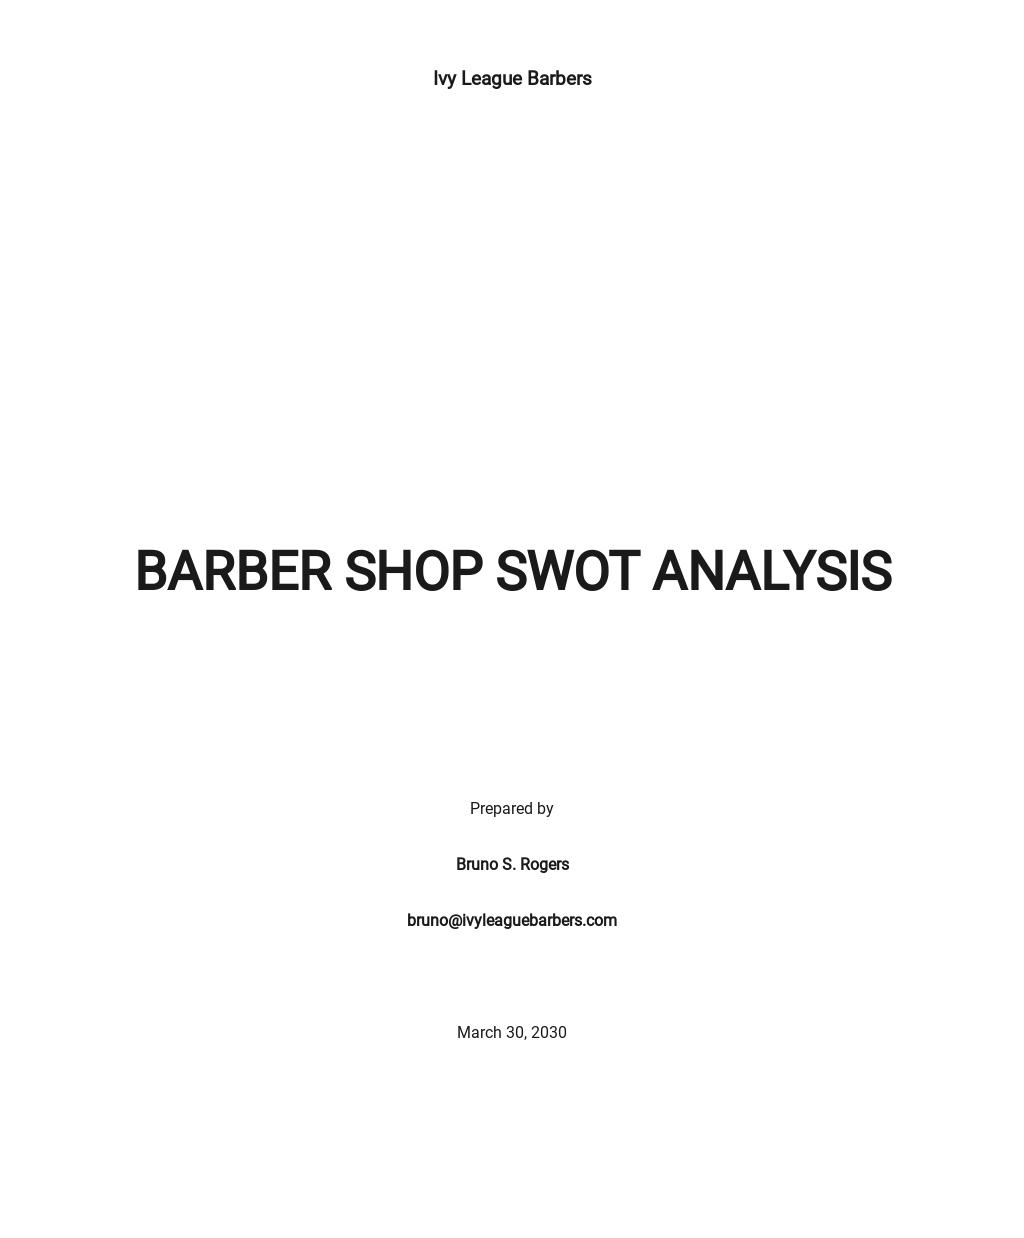 Barber Shop SWOT Analysis Template